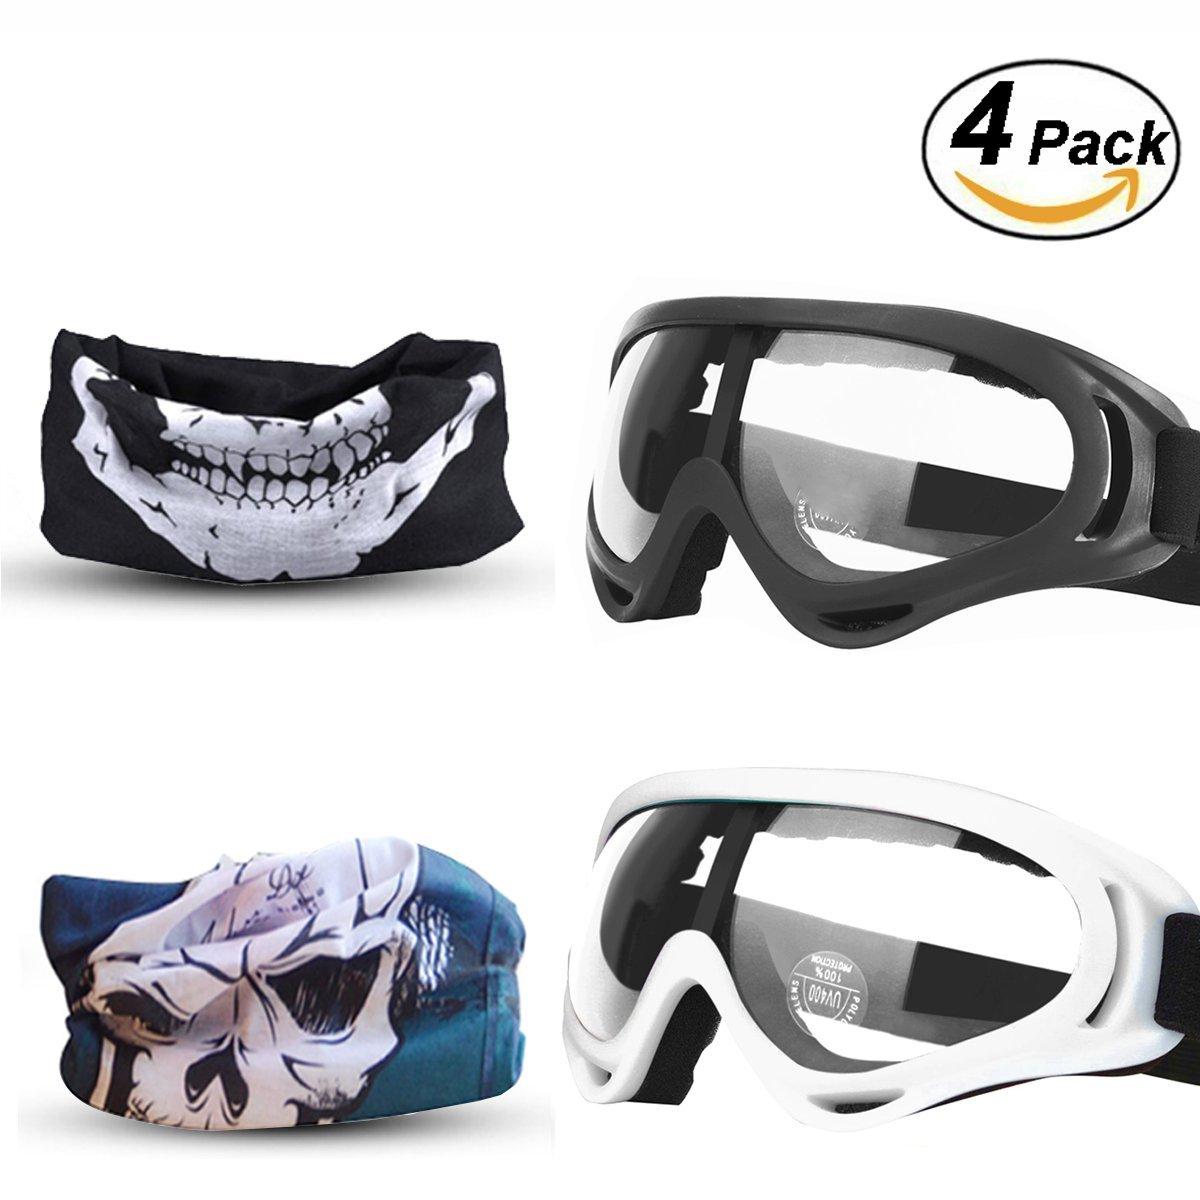 2-Sets Tactical Mask and Goggles for Nerf Guns N-Strike Elite Series Foam